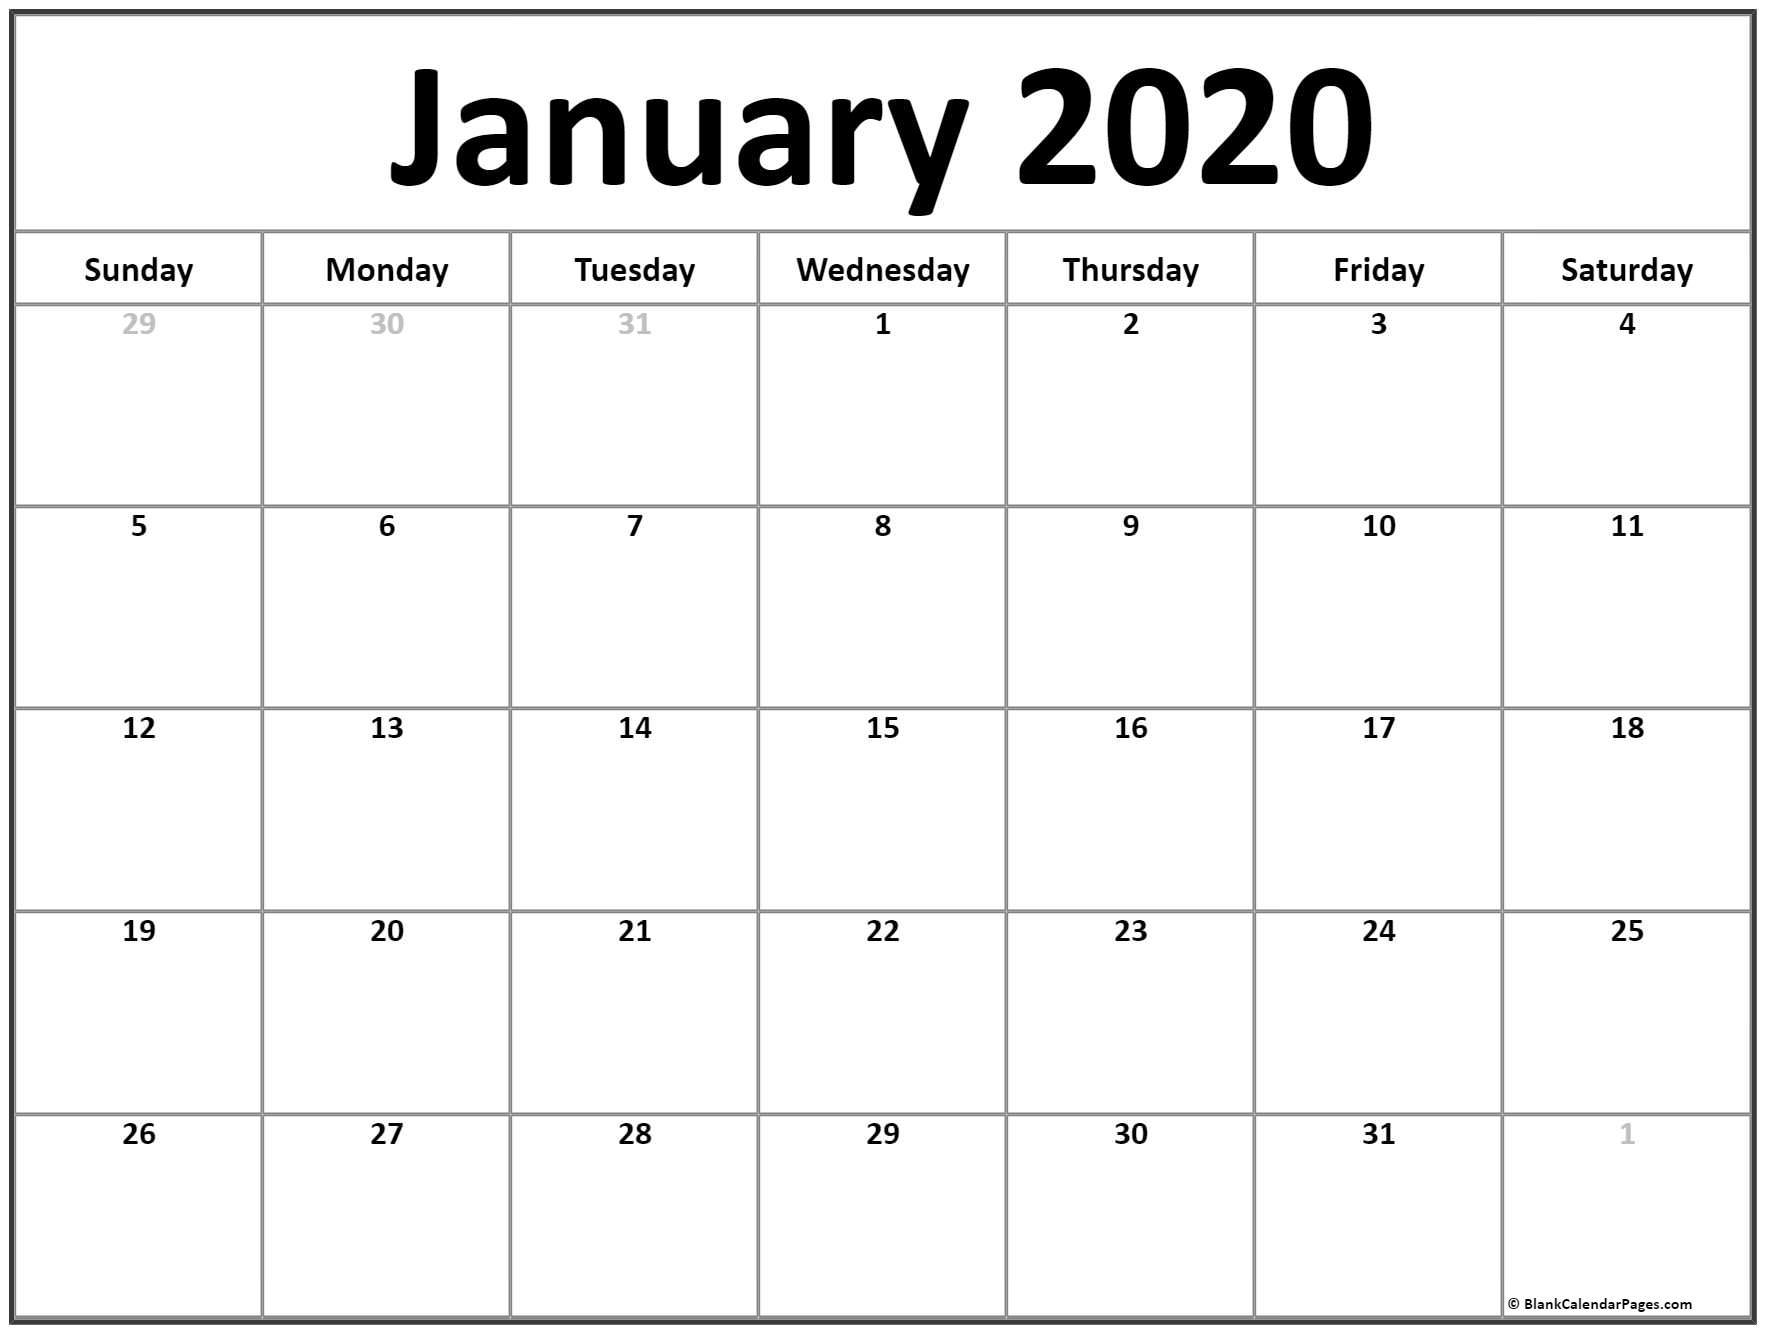 January Calendar 2020 Template - Wpa.wpart.co